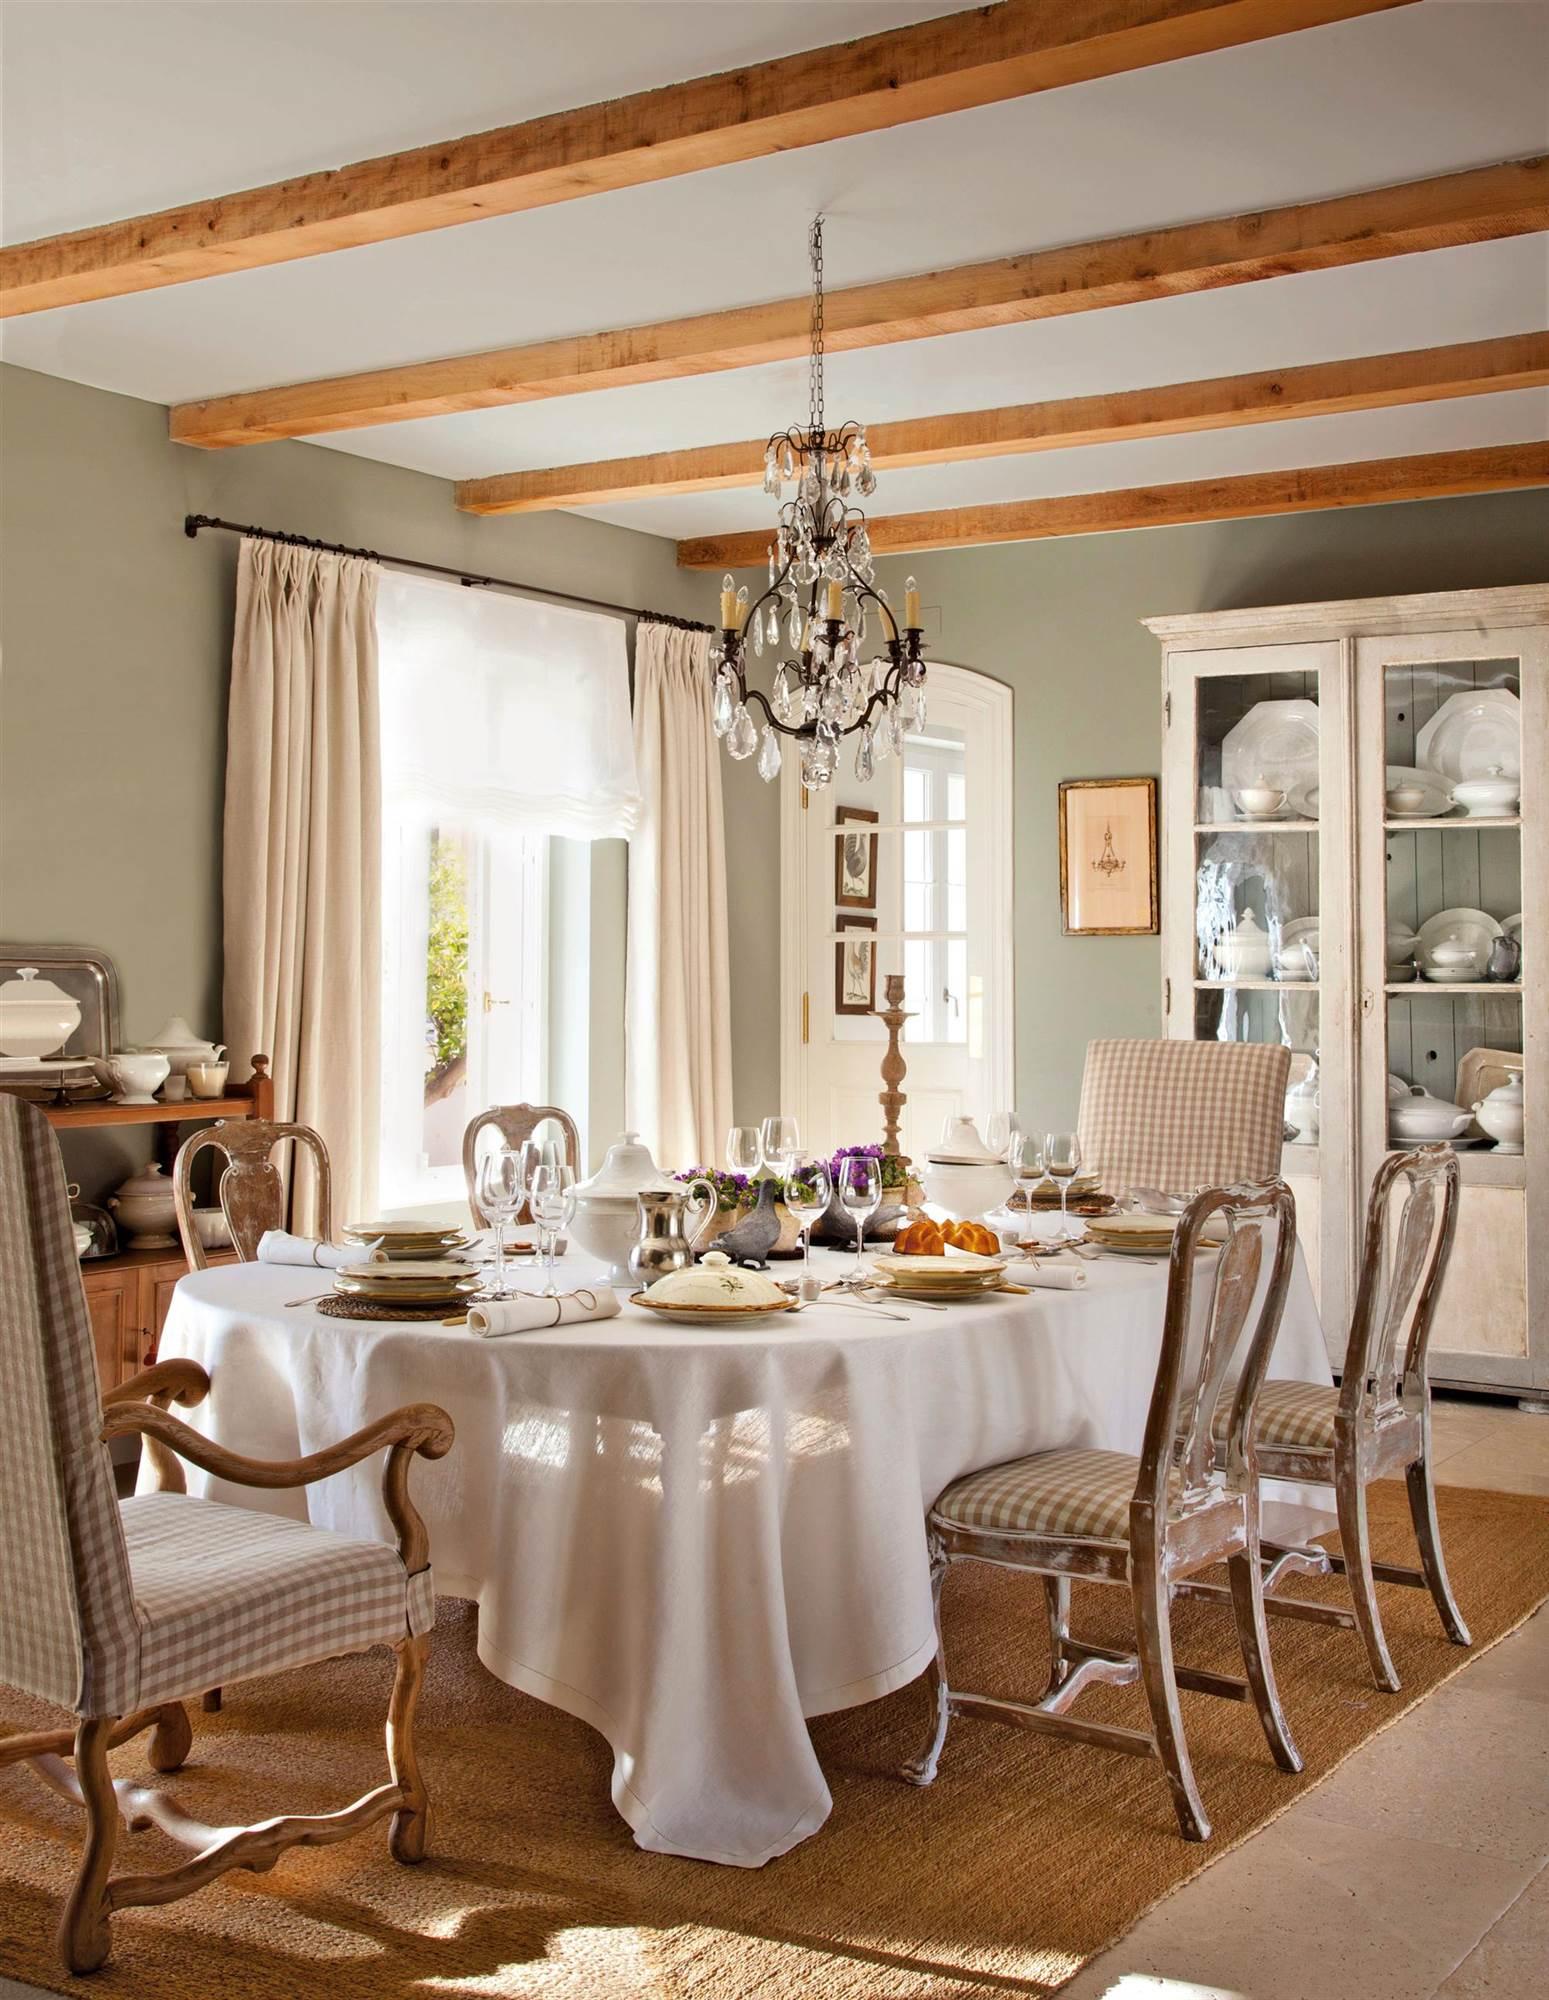 Paredes comedor fabulous ideas para decorar las paredes - Decorar paredes comedor ...